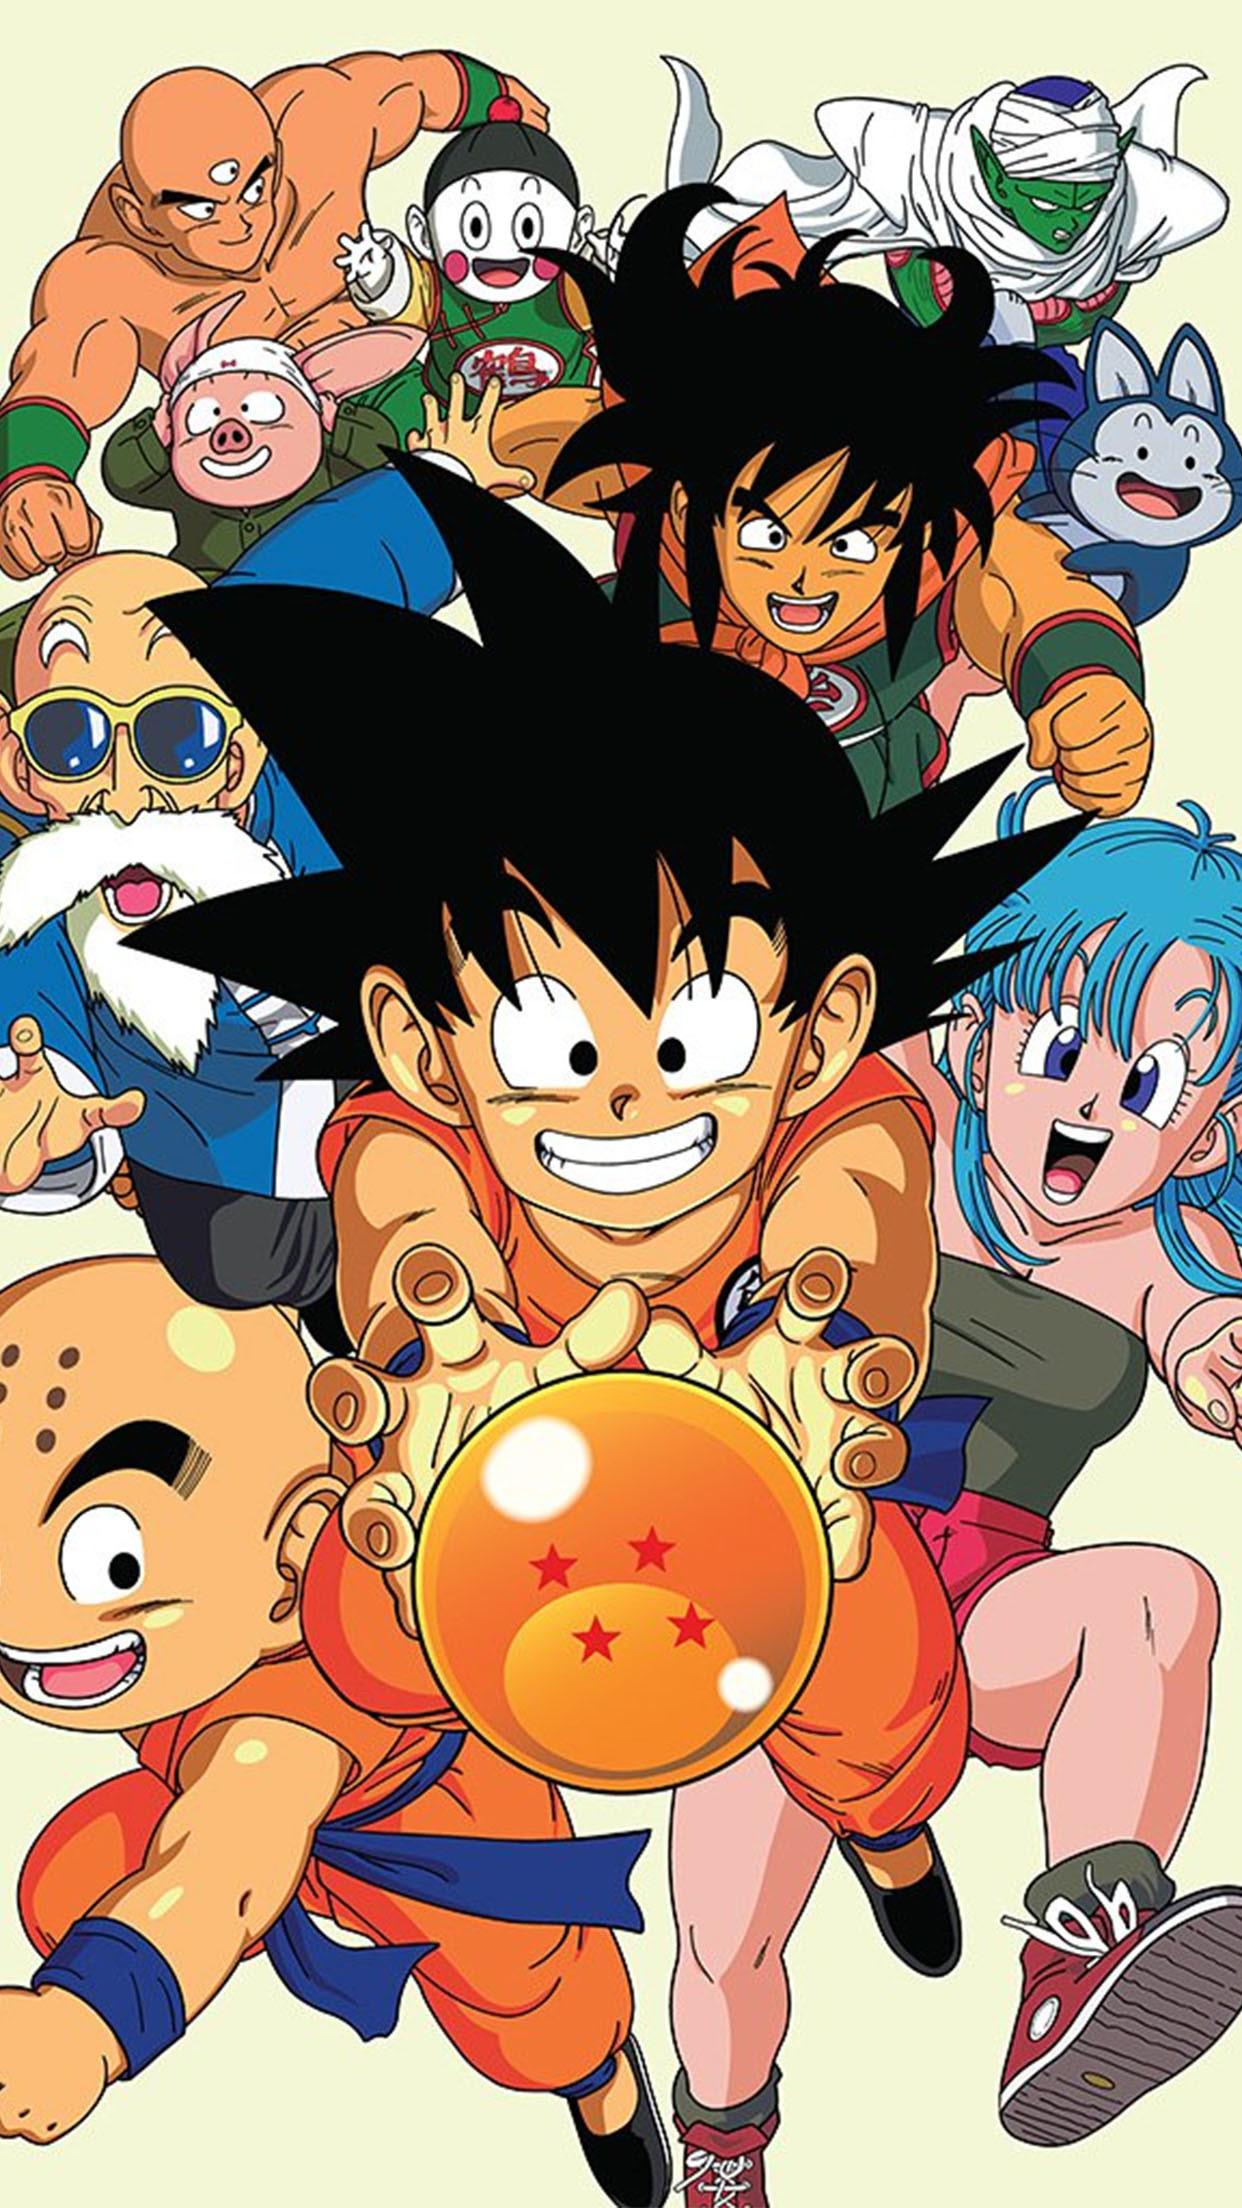 Goku Dragon Ball Z Wallpaper Iphone 7 Gambarku